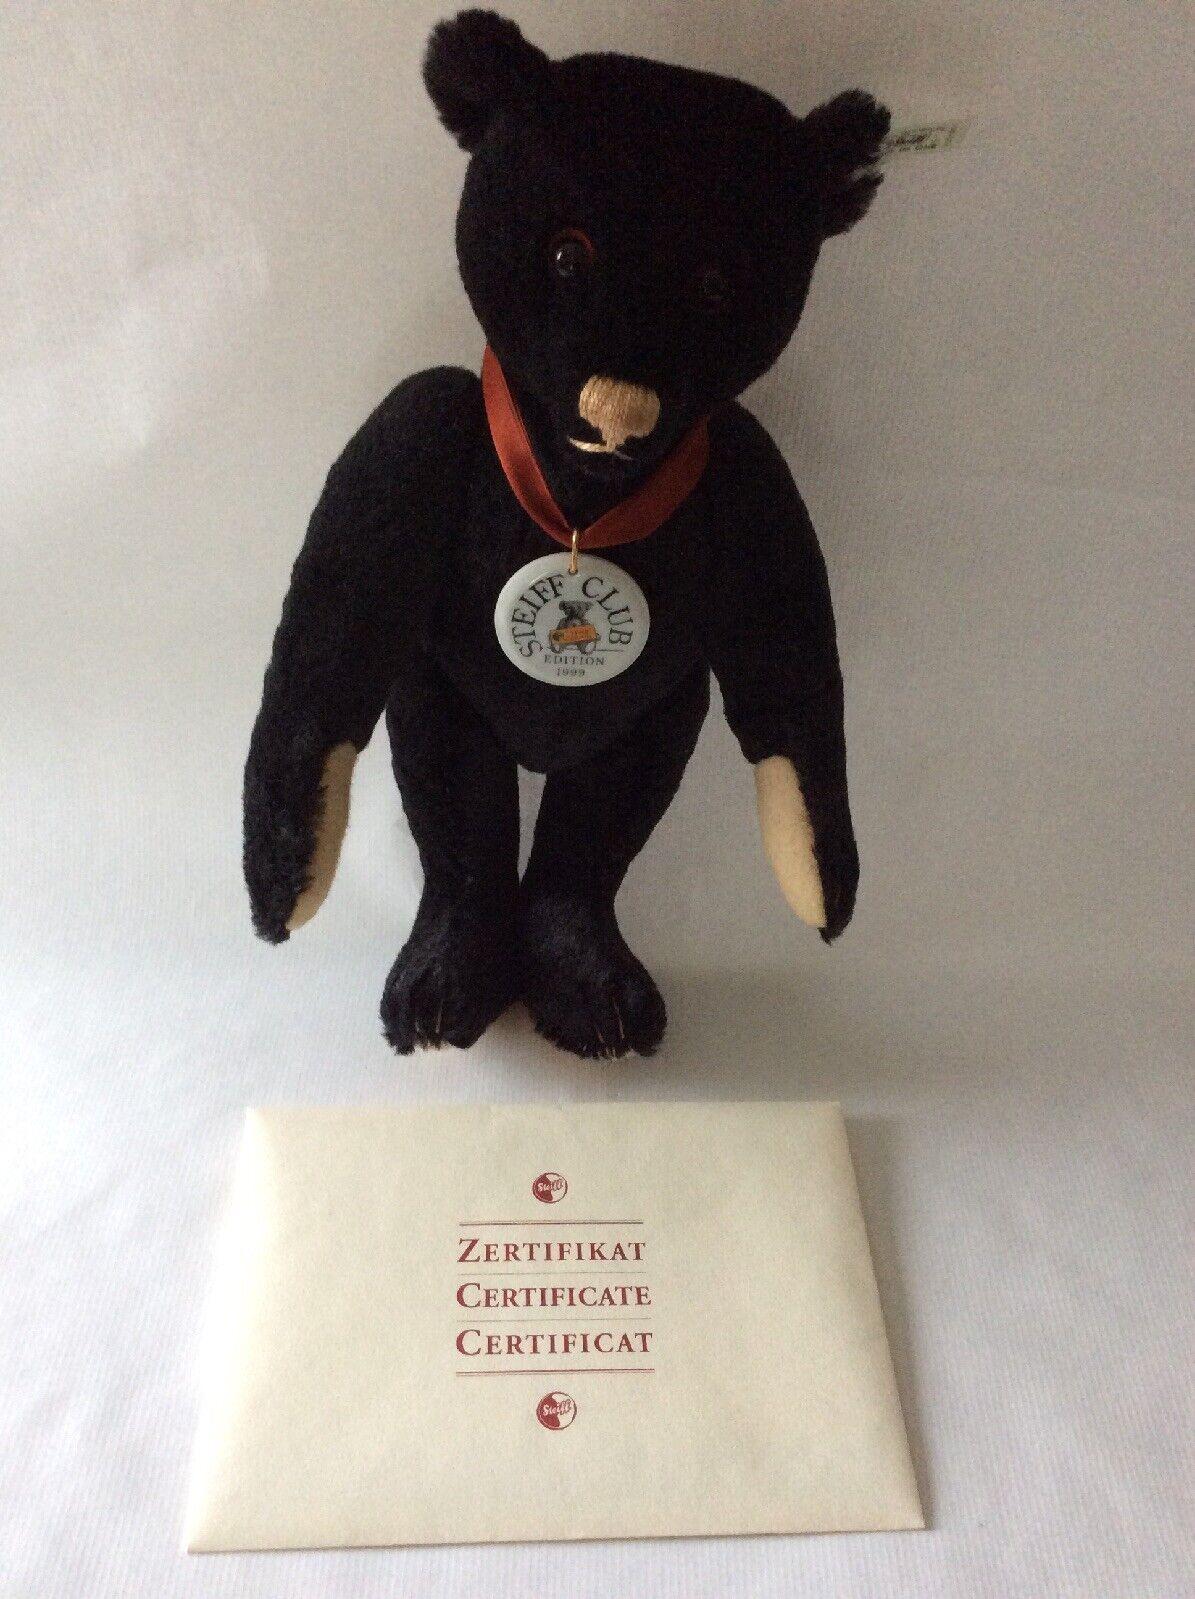 Steiff Club Edition 1999/2000 1912 Replica Schwarz 35 Mohair Teddy Bear